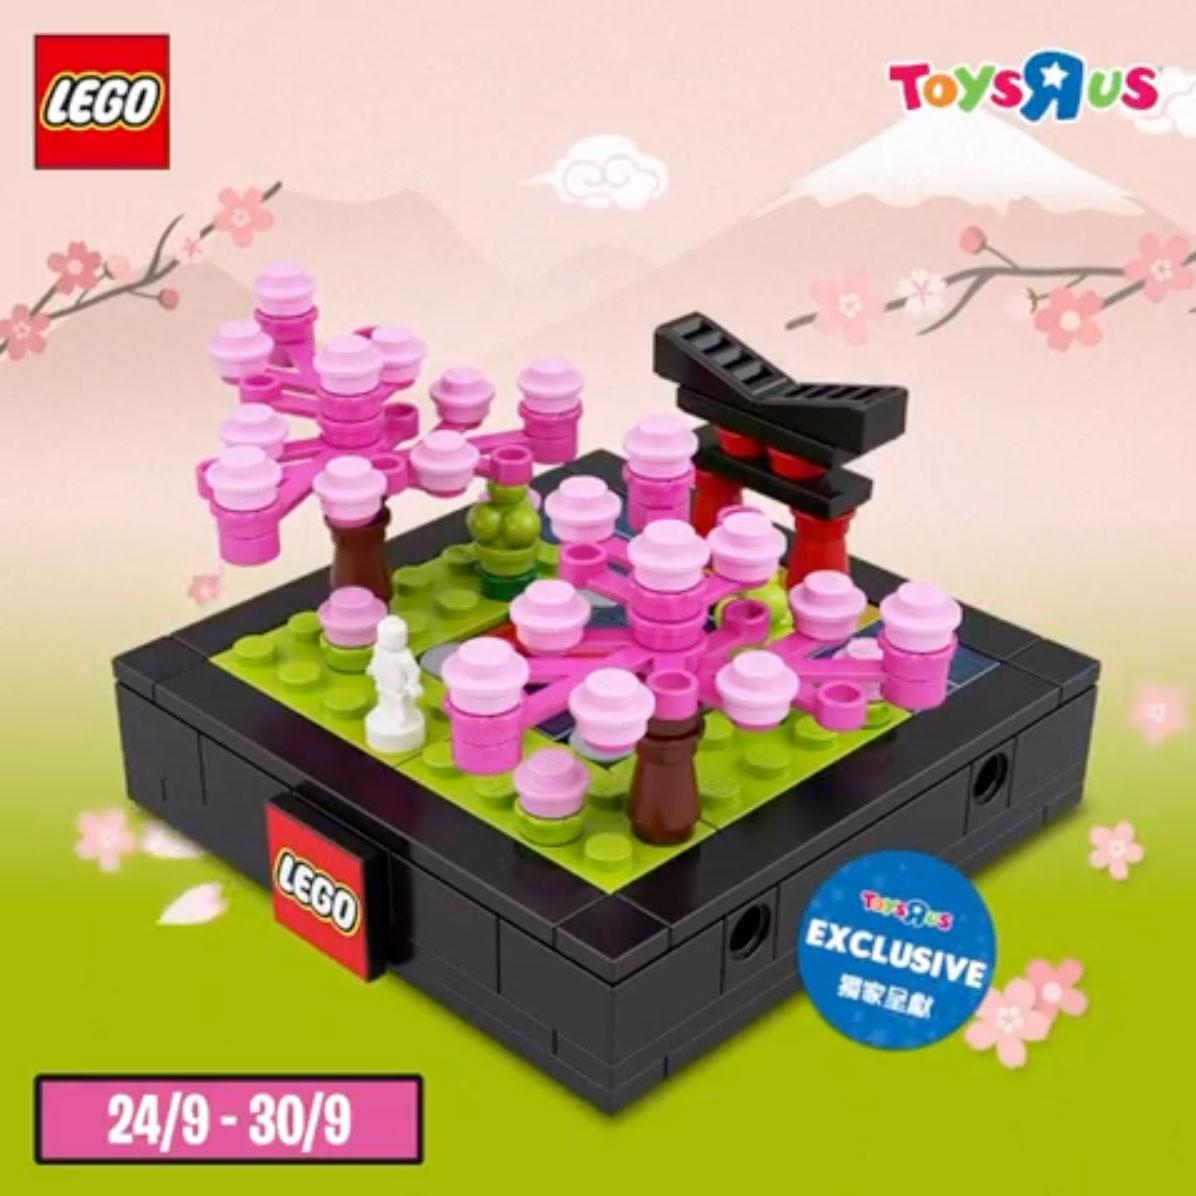 lego-bricktober-tru-24093009